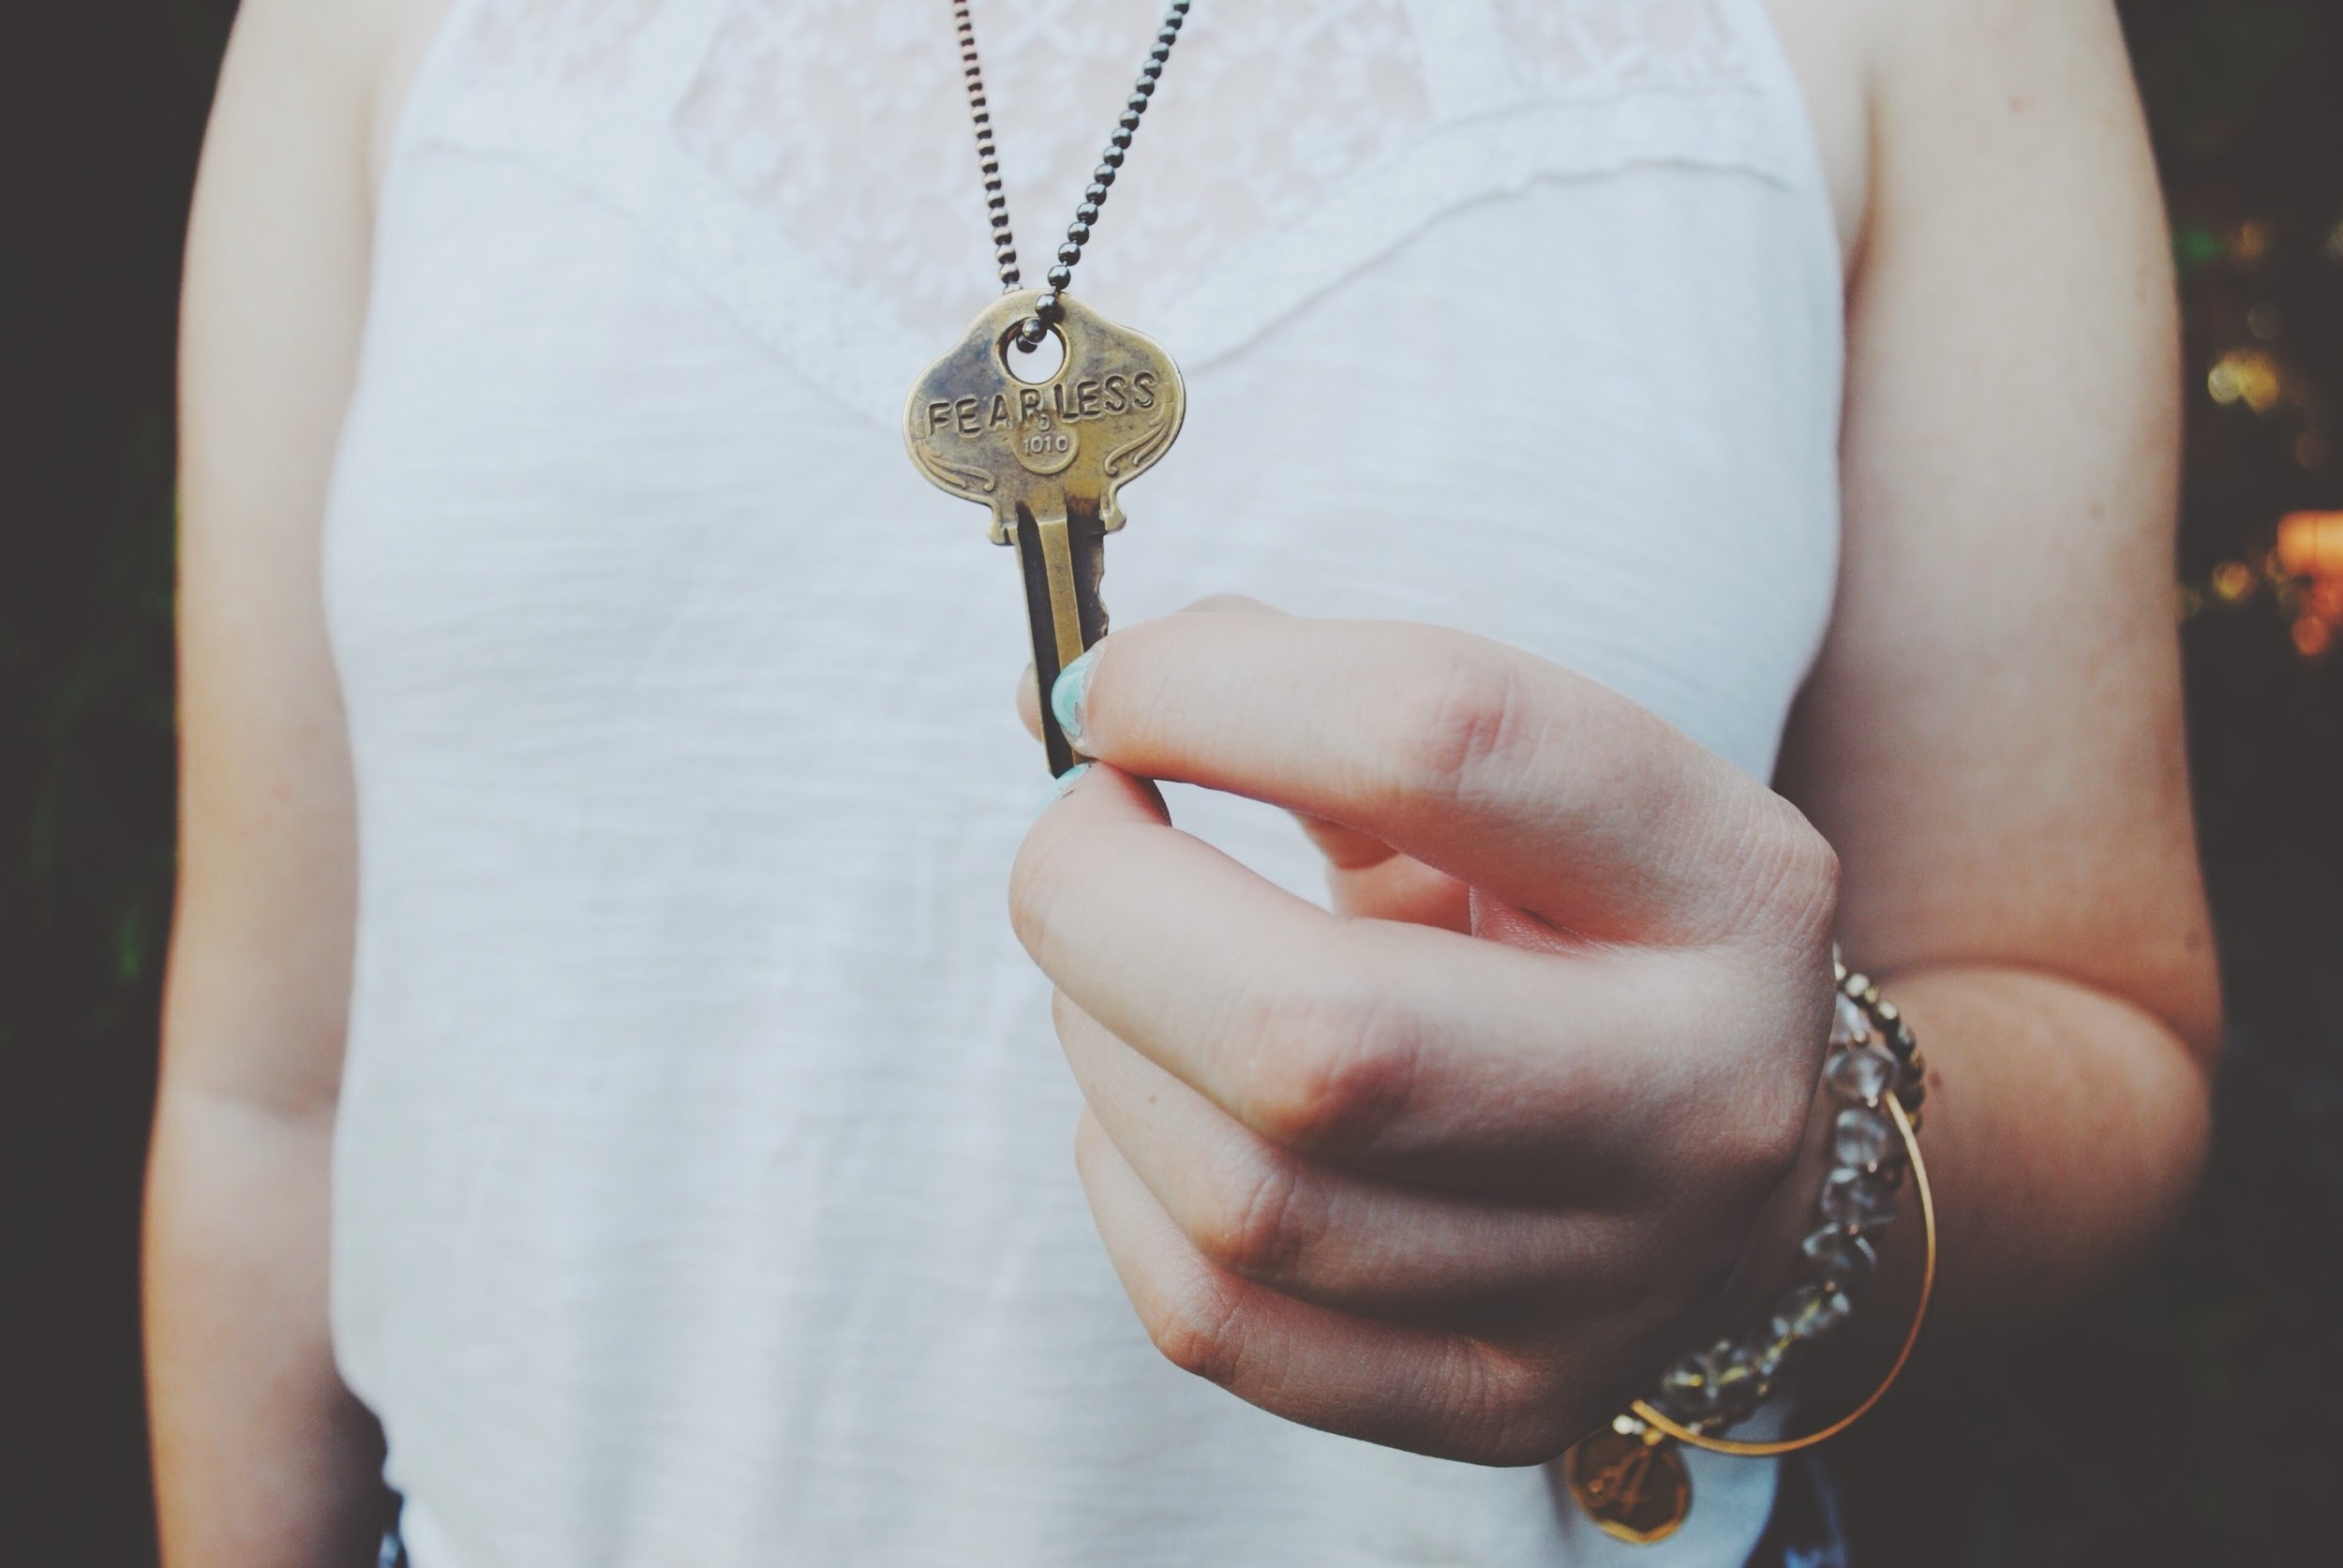 fearless key